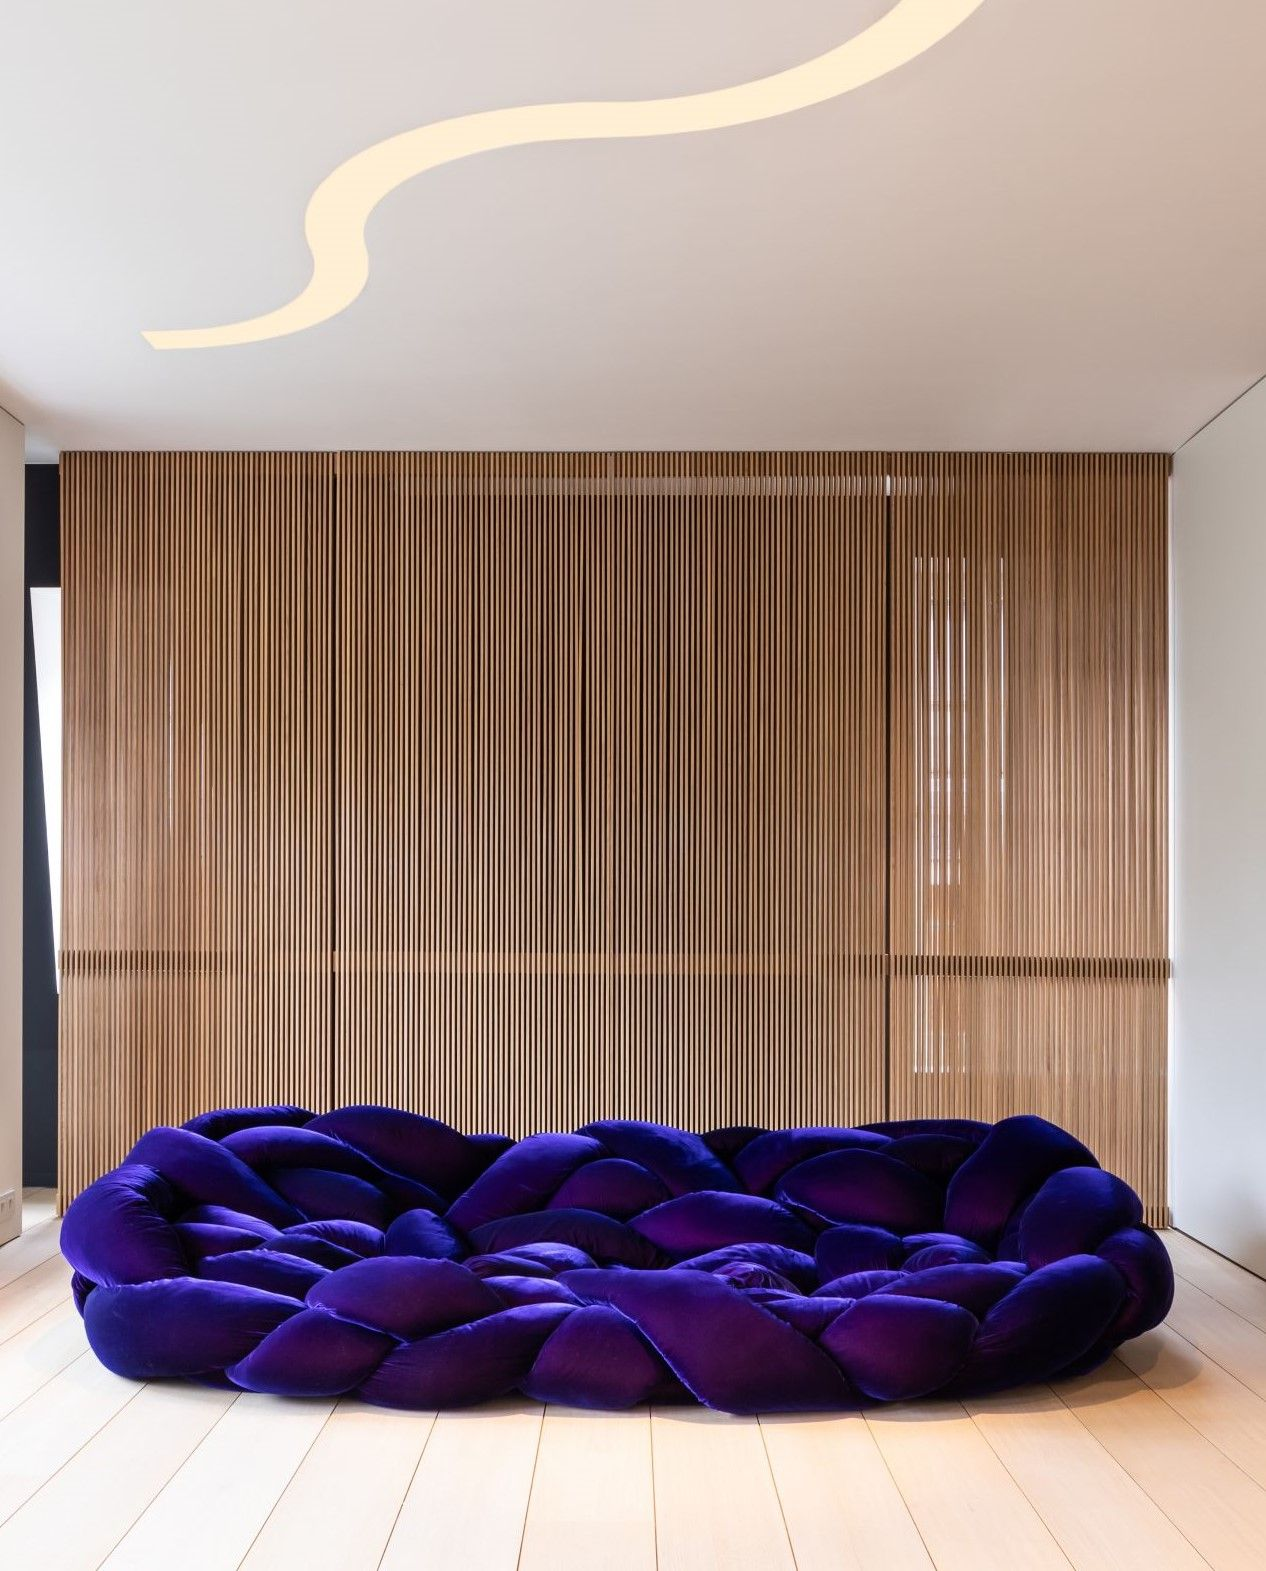 Appartamento ad Anversa - image 1